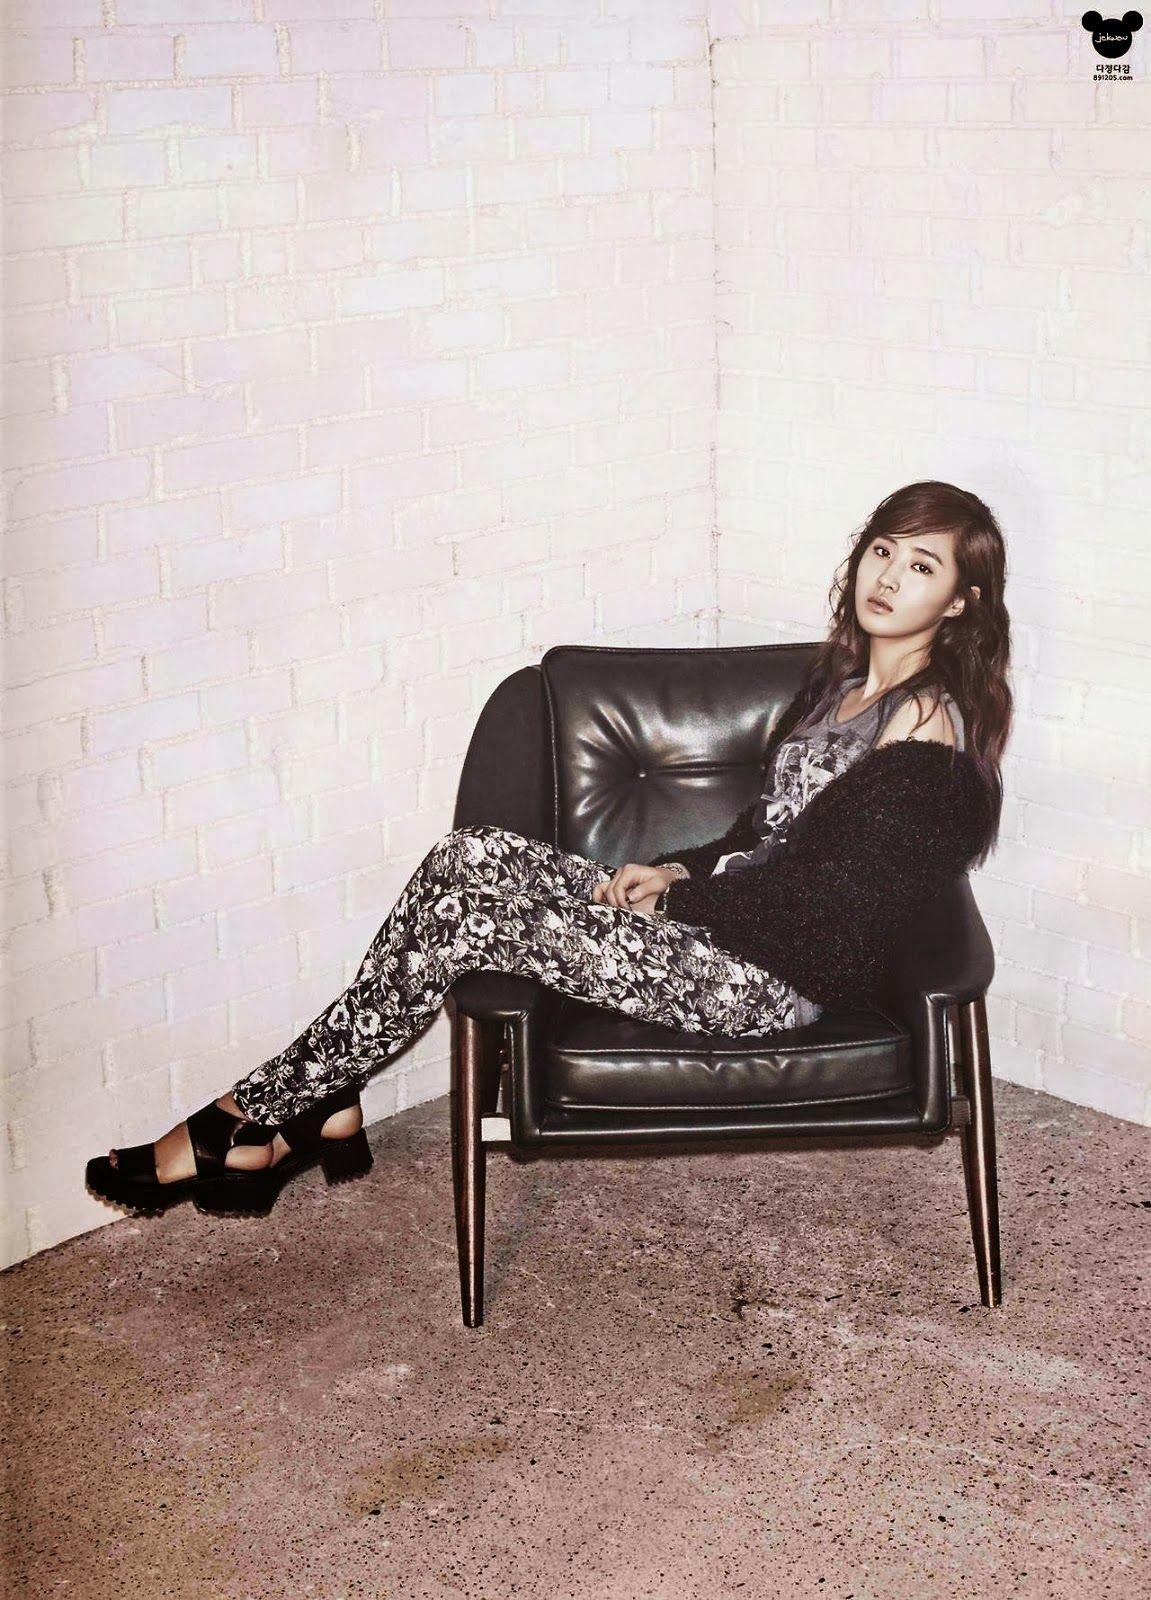 Girls' Generation's Yuri models for Harper's Bazaar magazine - Latest K-pop News - K-pop News   Daily K Pop News